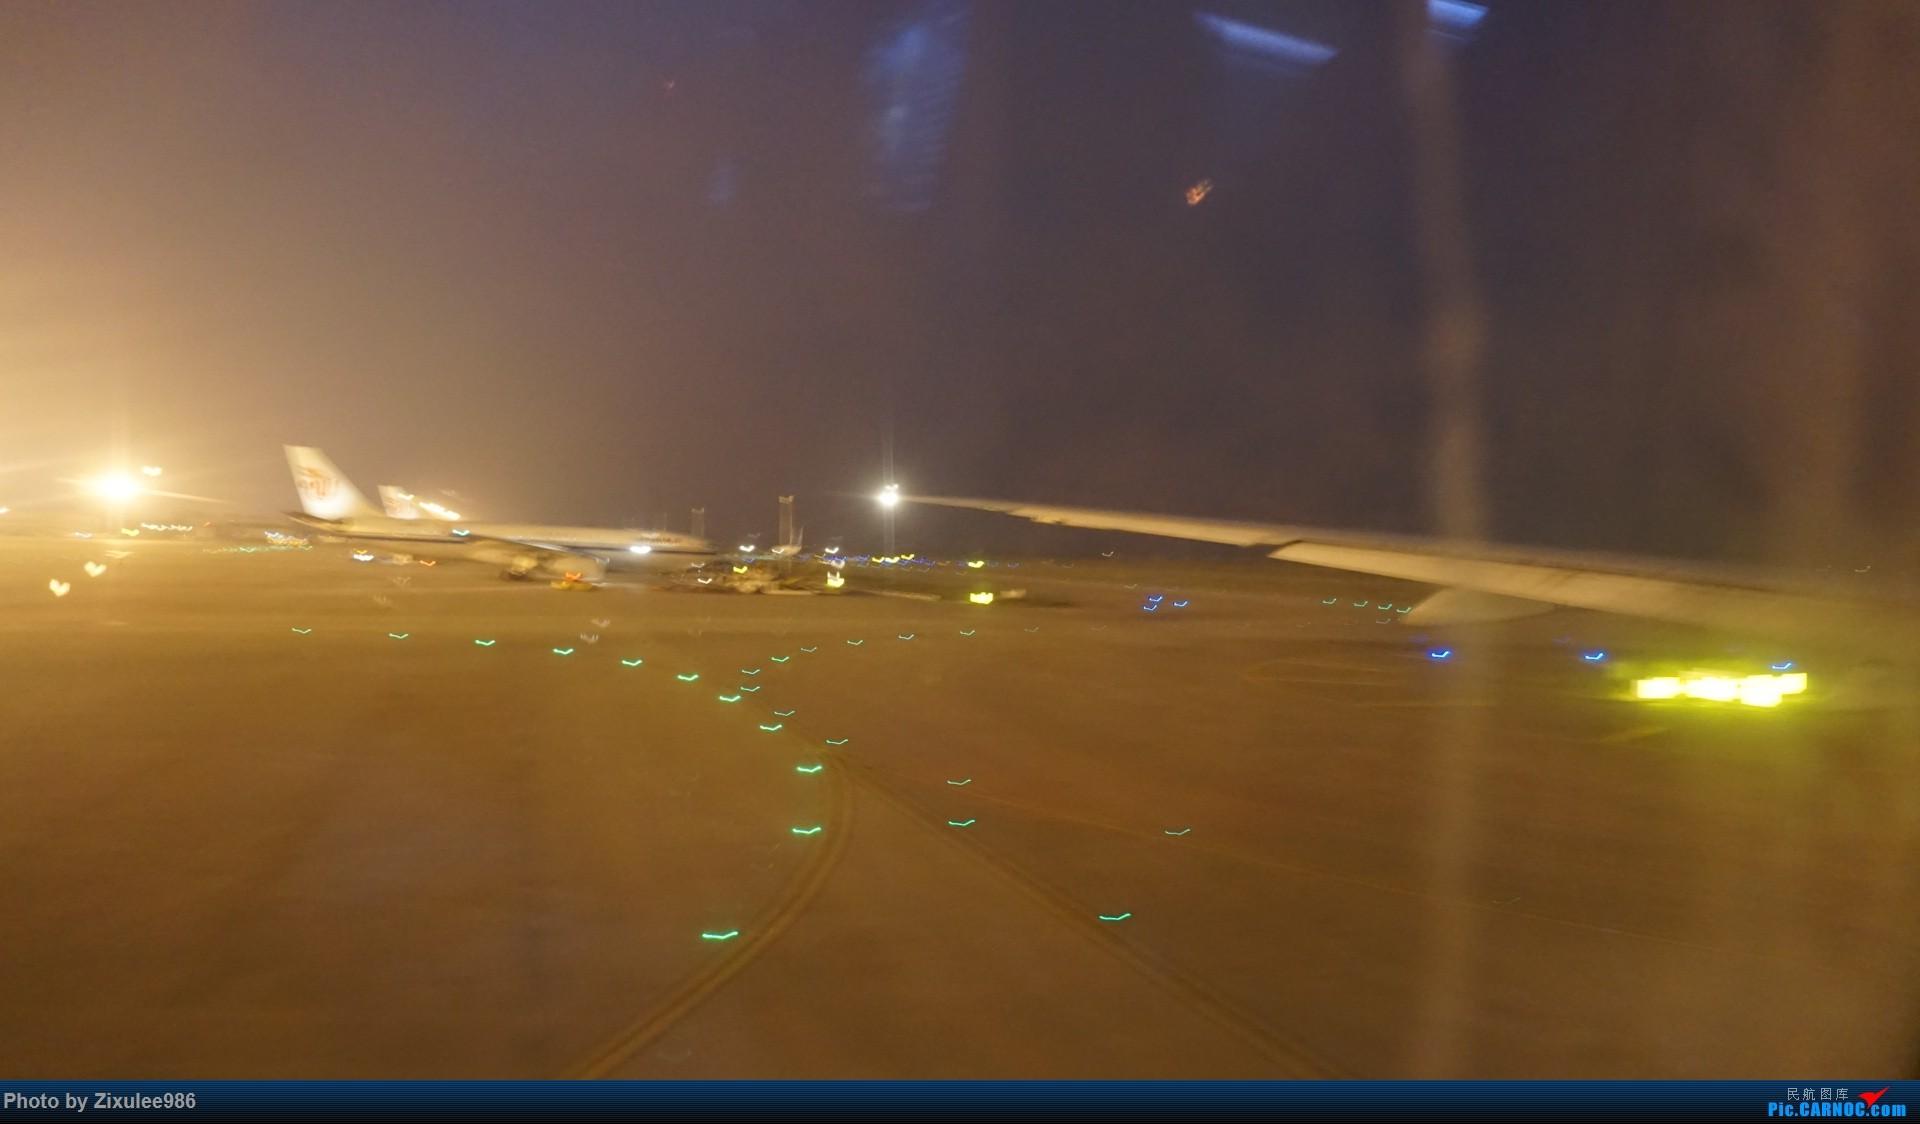 Re:[原创]加拿大21日游学之旅 (二)~加航AC28..PVG-YYZ到达多村后的雨天~多图缓更,请各位大侠谅解~ BOEING 777-333 (ER) C-FITL 中国上海浦东国际机场